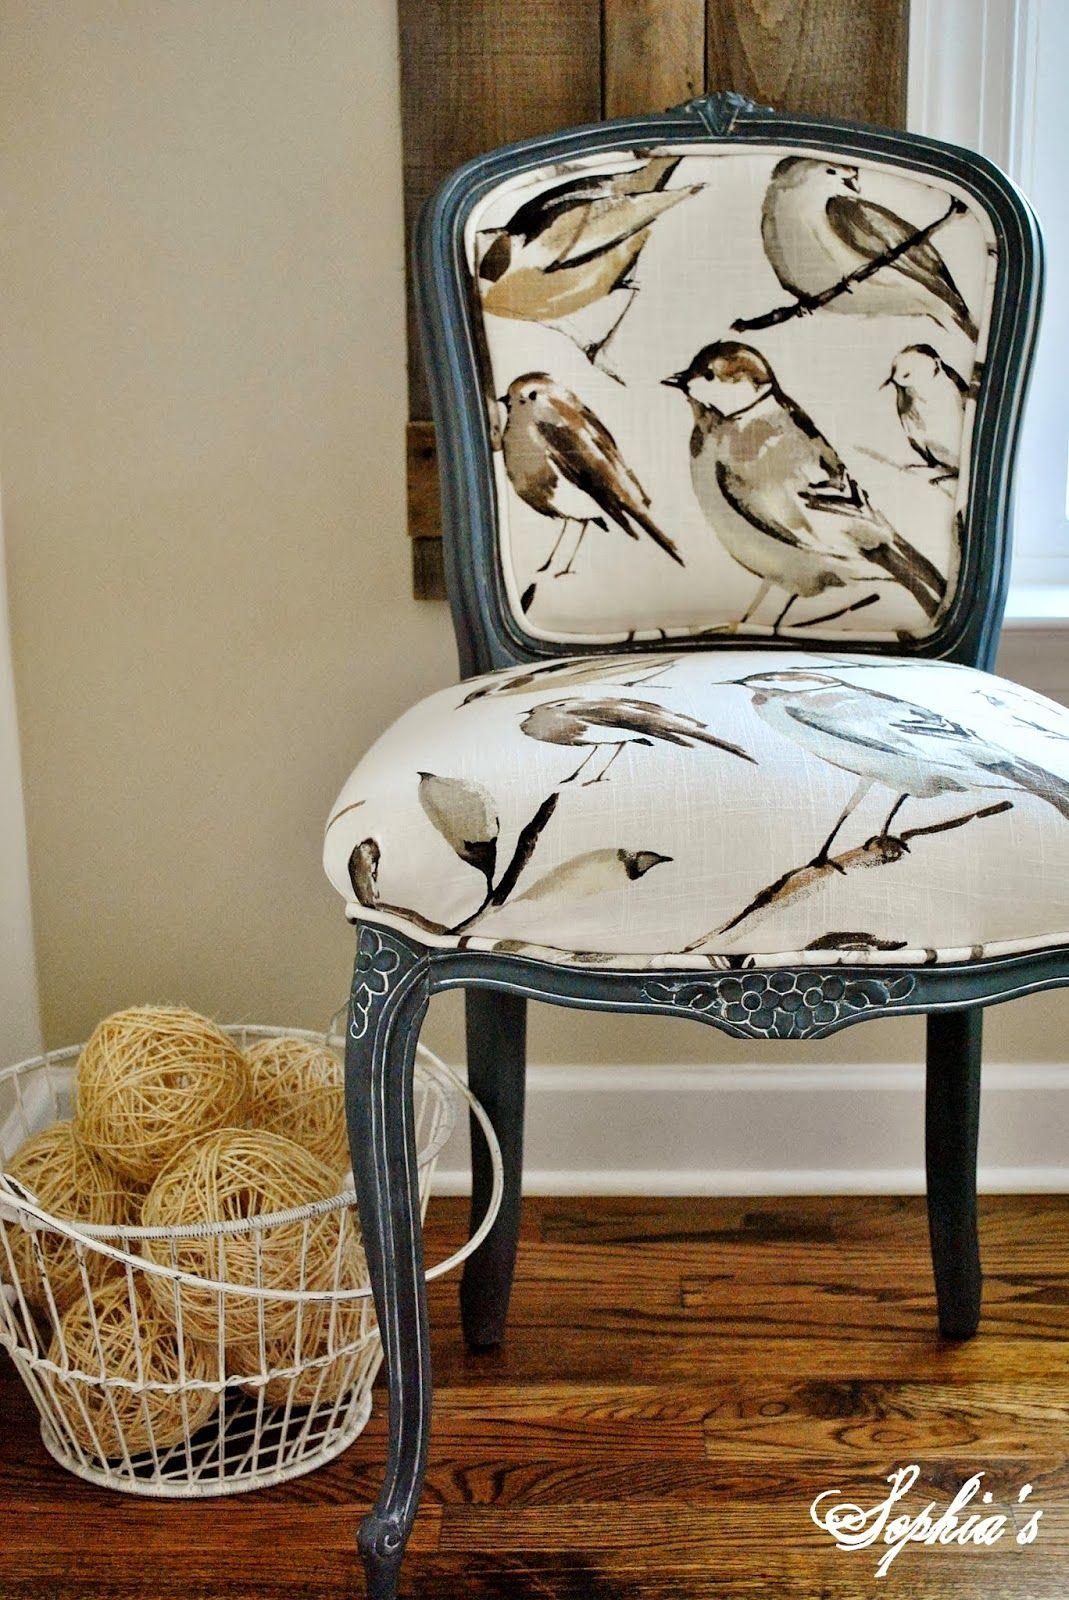 ansprechender bezugstoff alten charakter erhalten pinterest m bel st hle und sessel. Black Bedroom Furniture Sets. Home Design Ideas